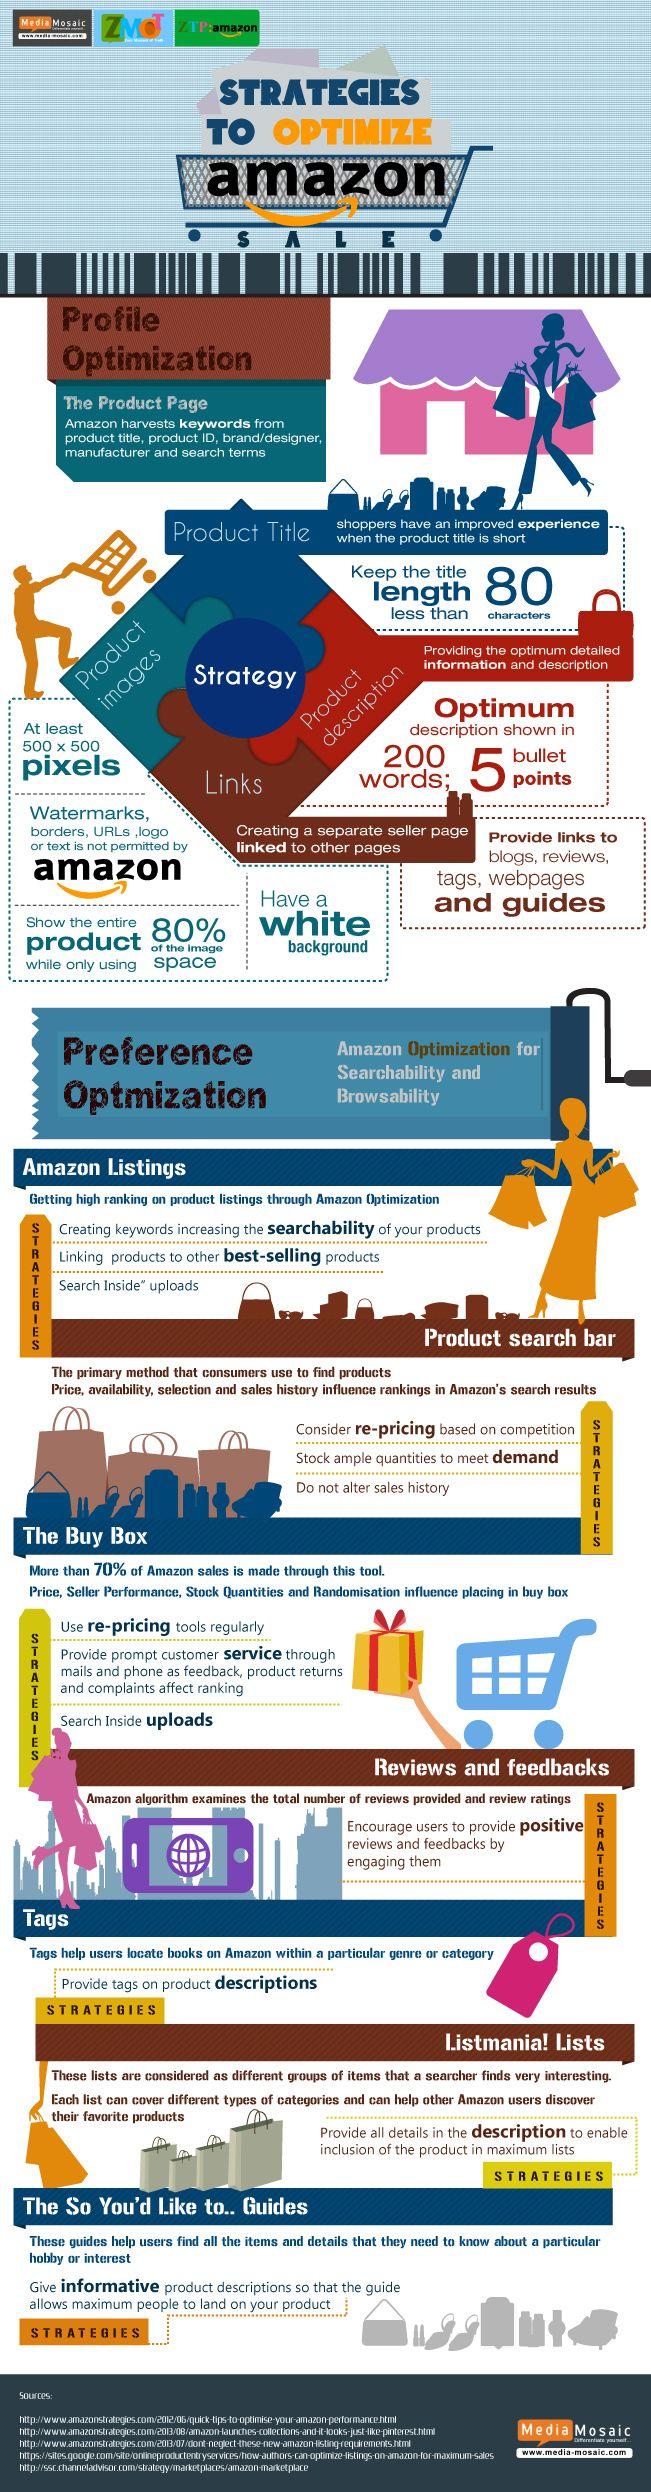 Las Mejores Estrategias para Optimizar Amazon / Best Strategies to Optimize Amazon